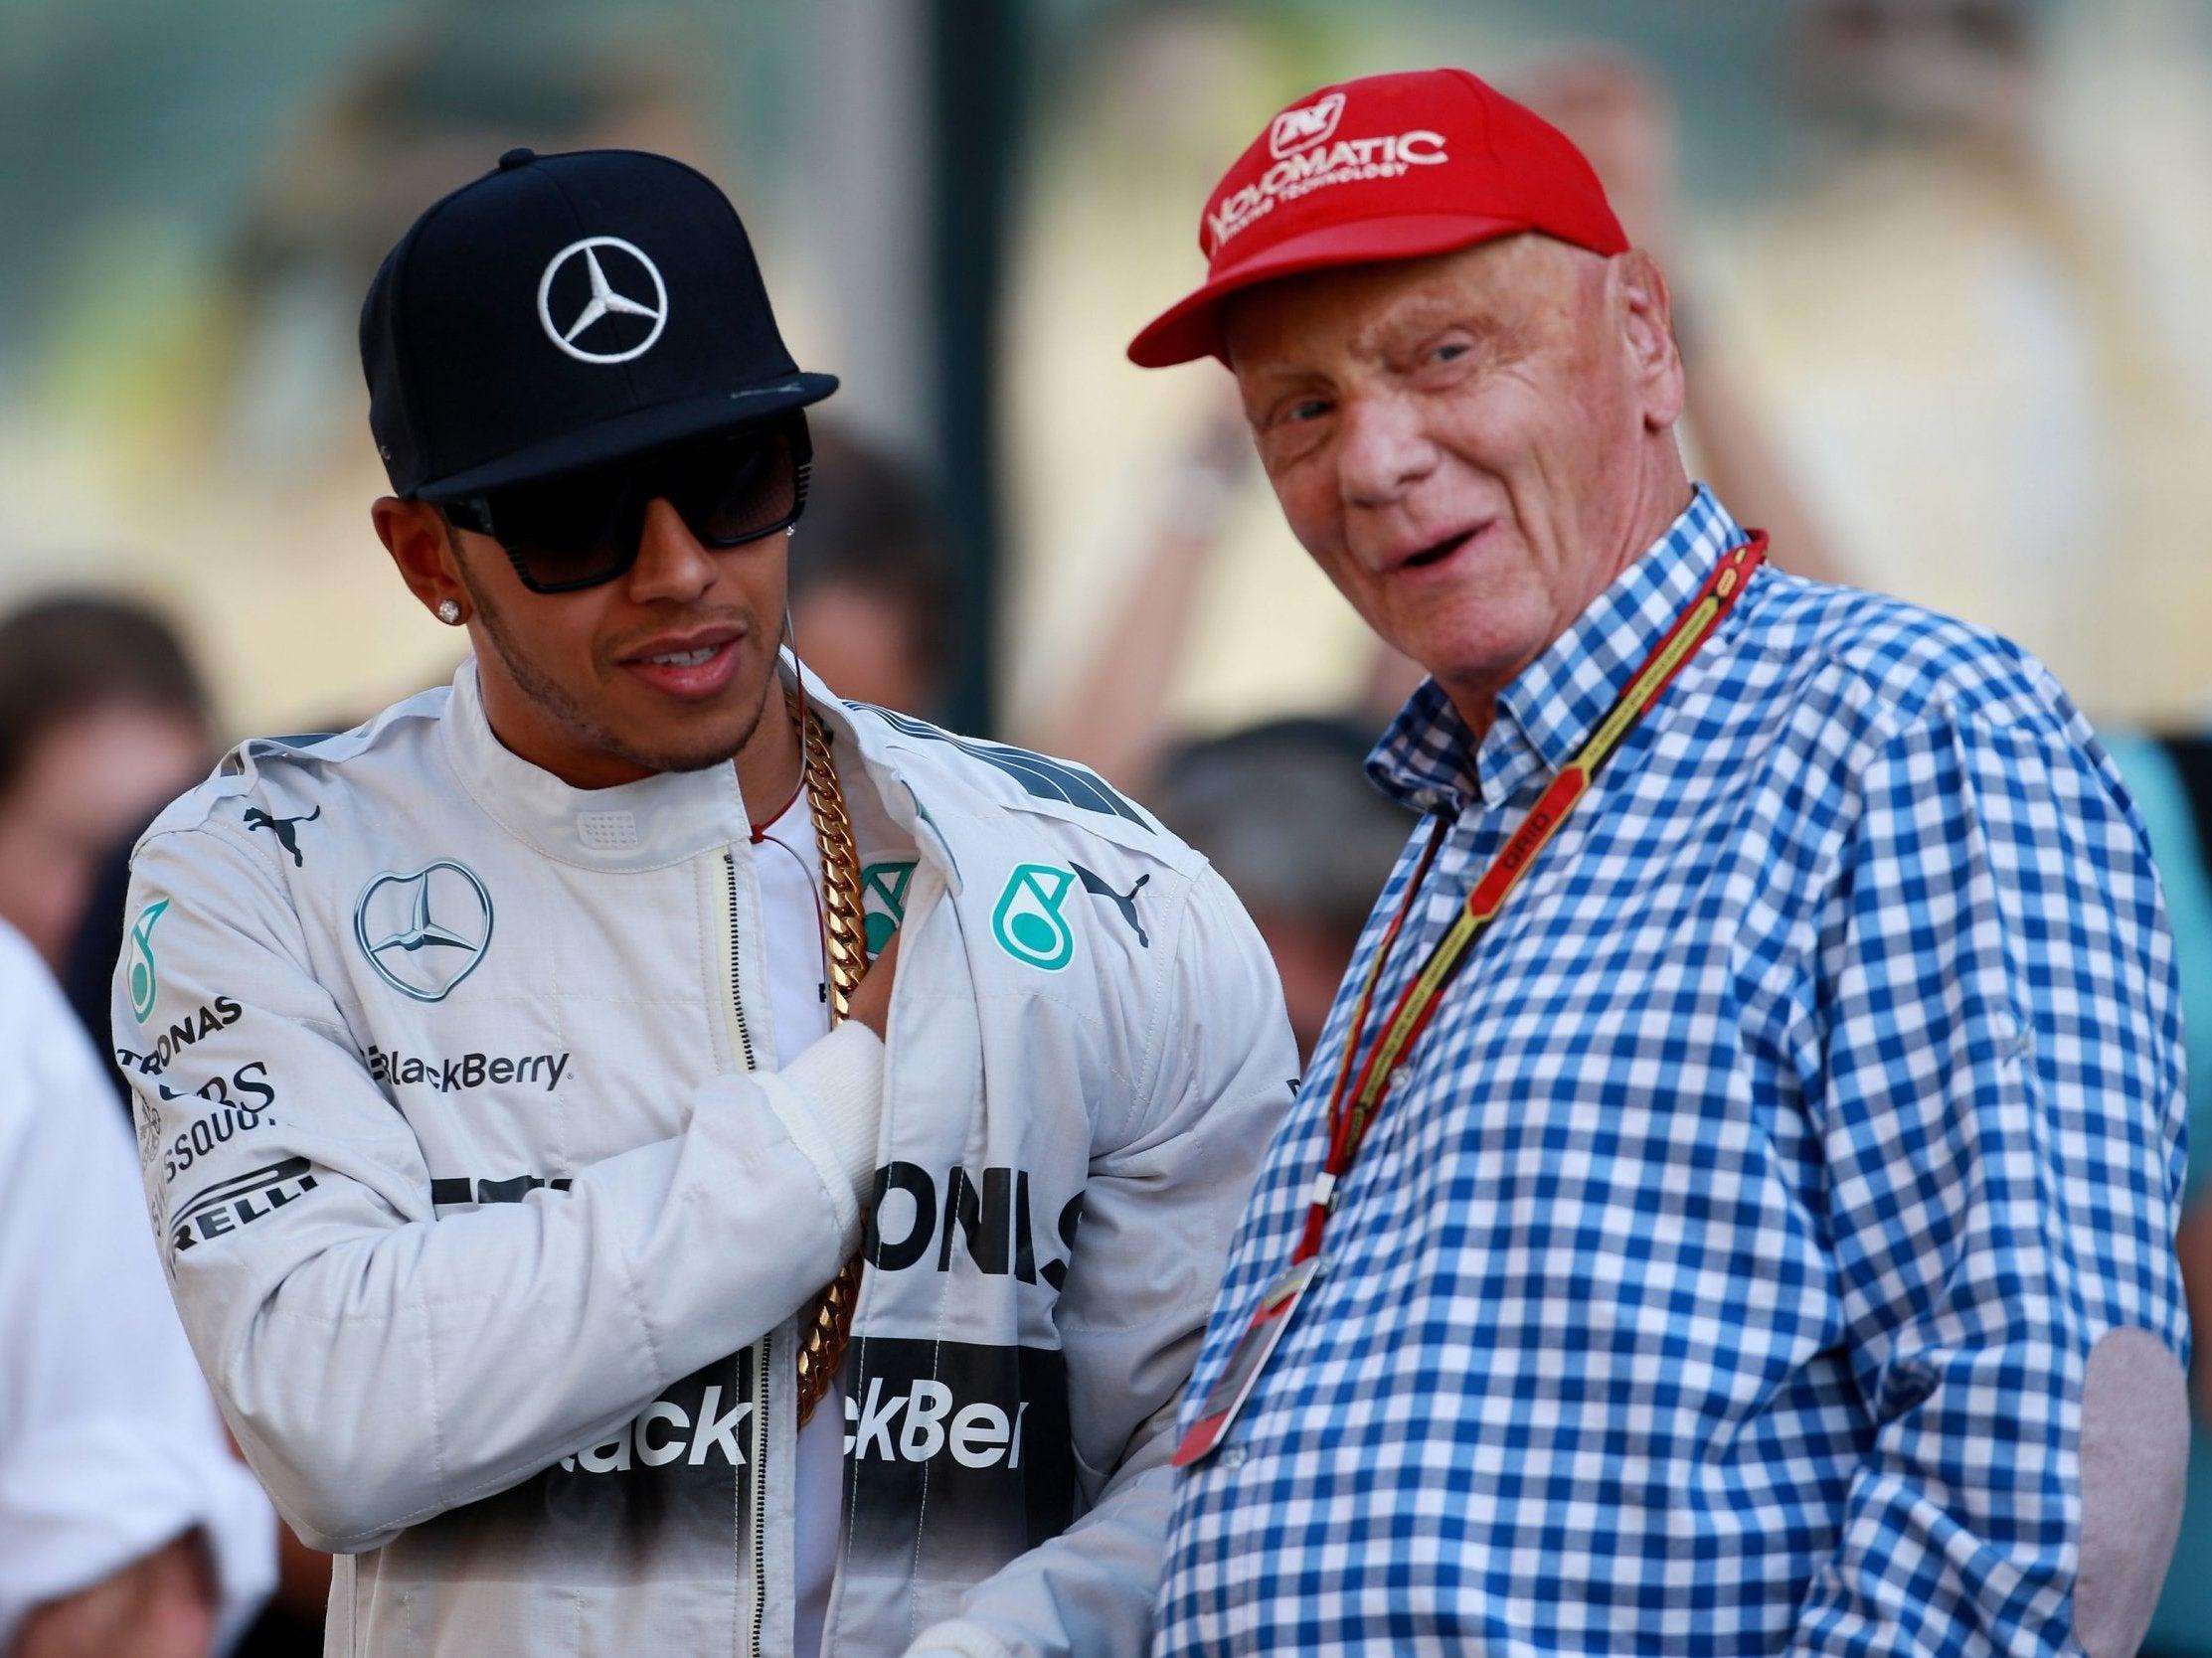 Japanese Grand Prix: Lewis Hamilton dedicates Mercedes' constructors' title to Niki Lauda